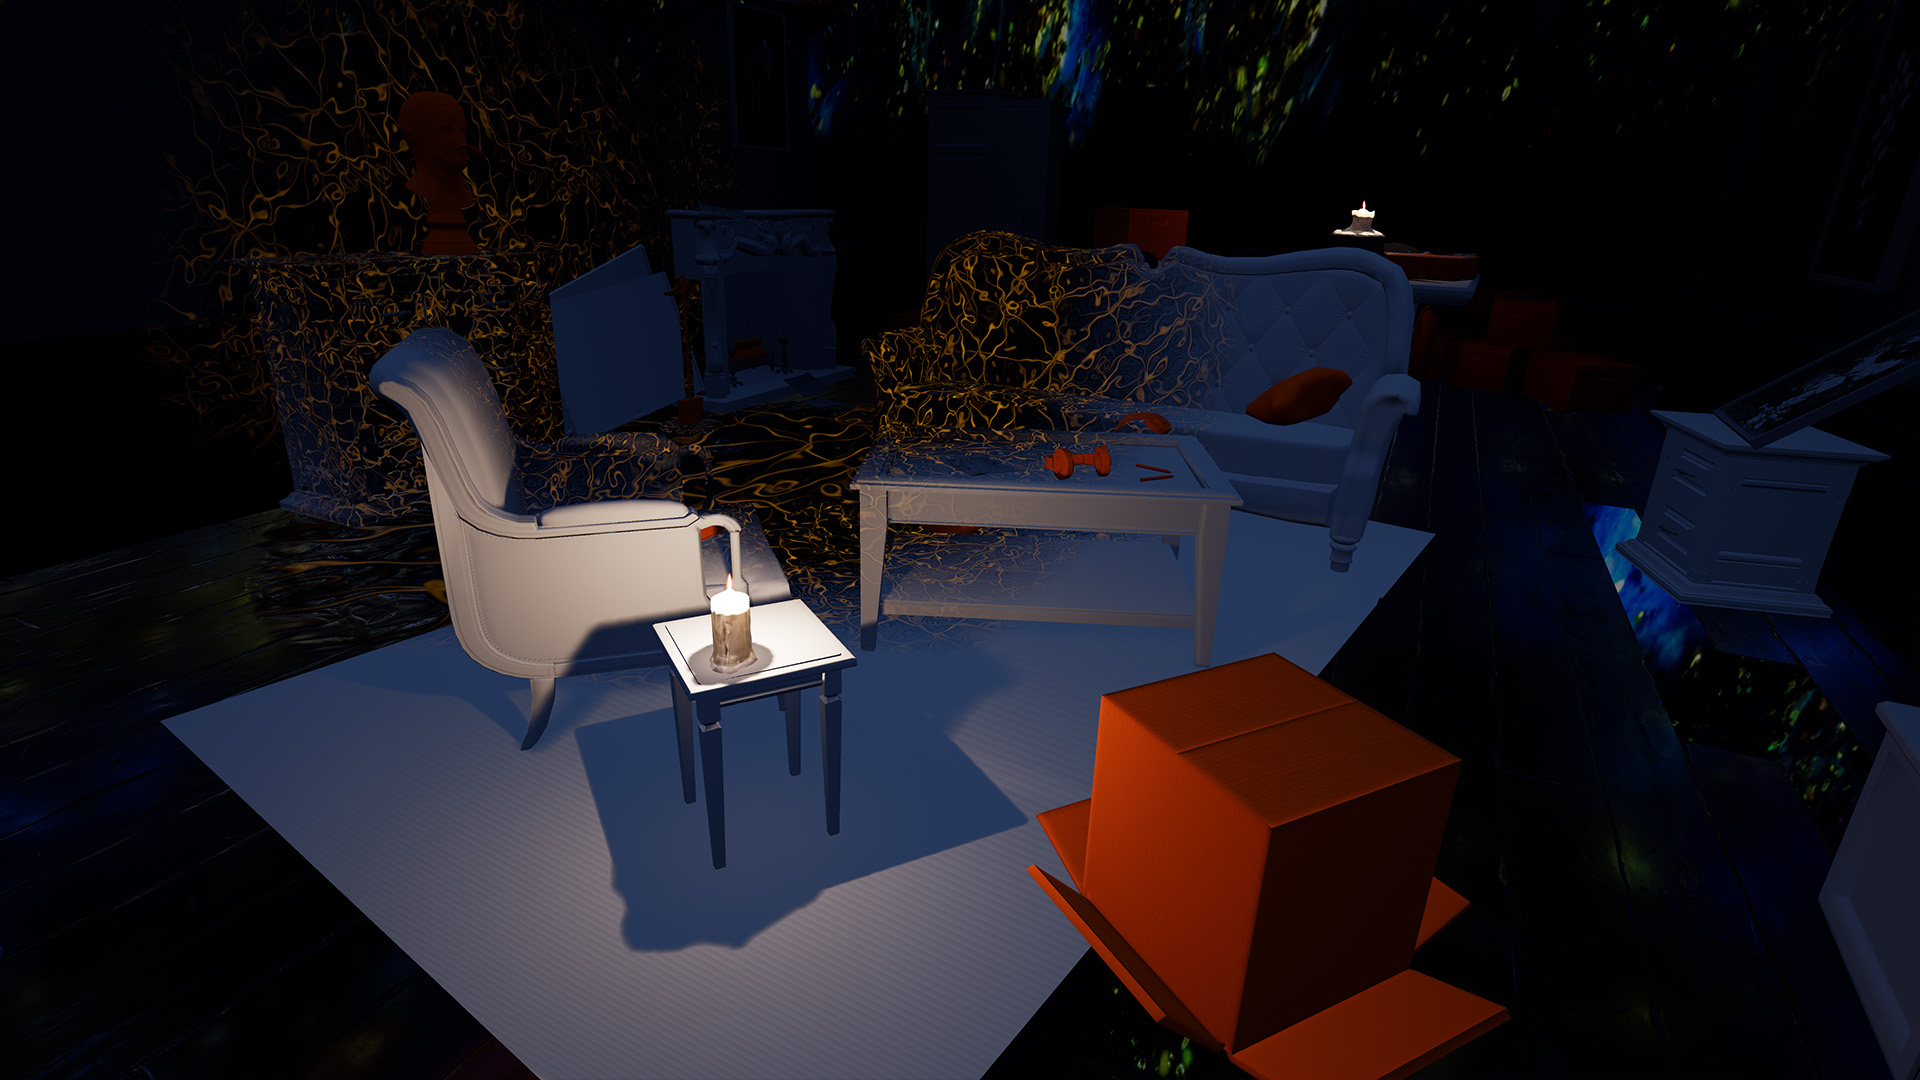 furniture on white carpet